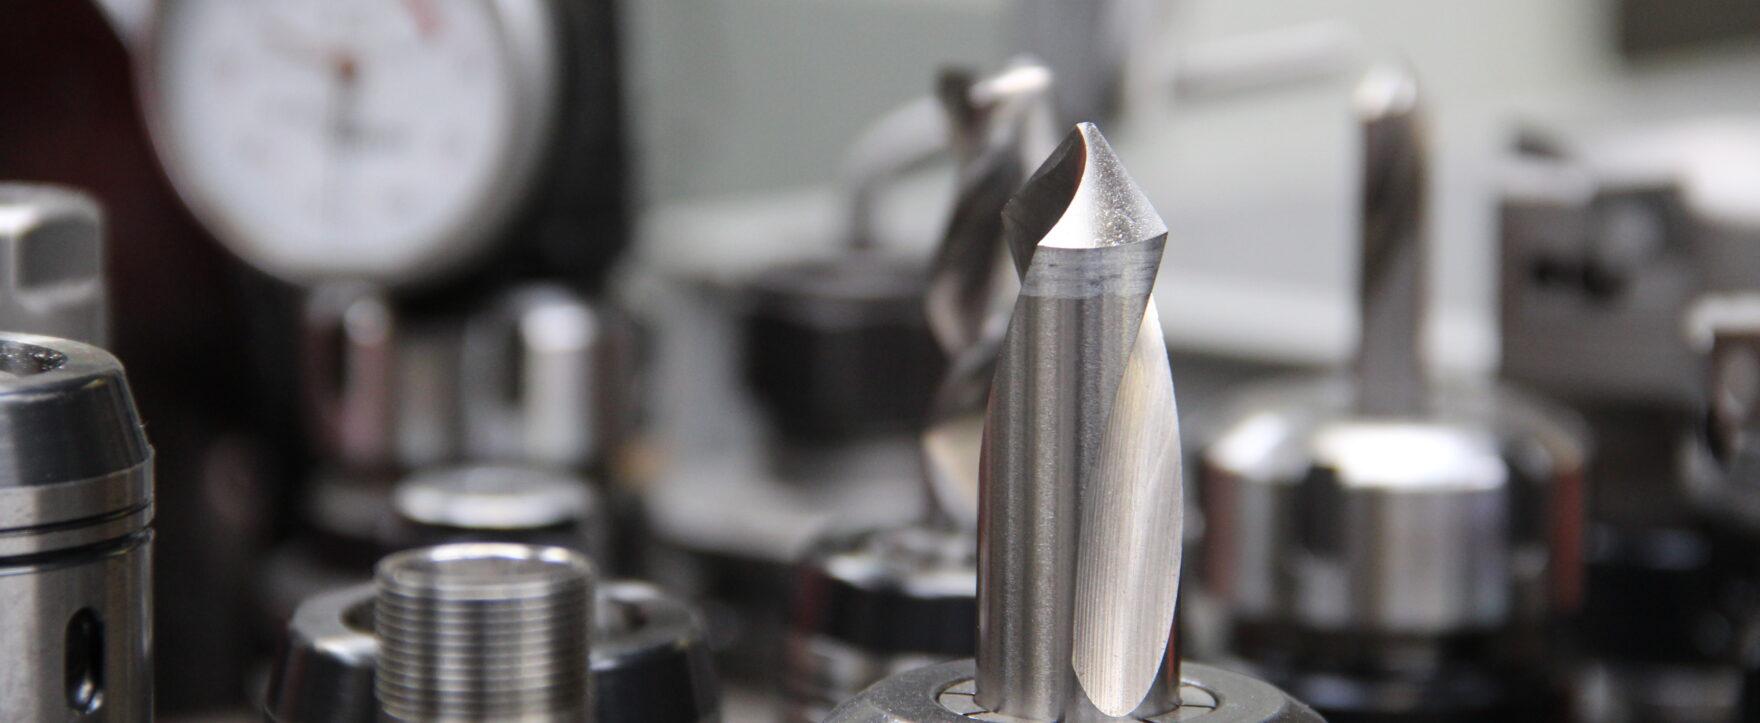 Precision Engineering drill